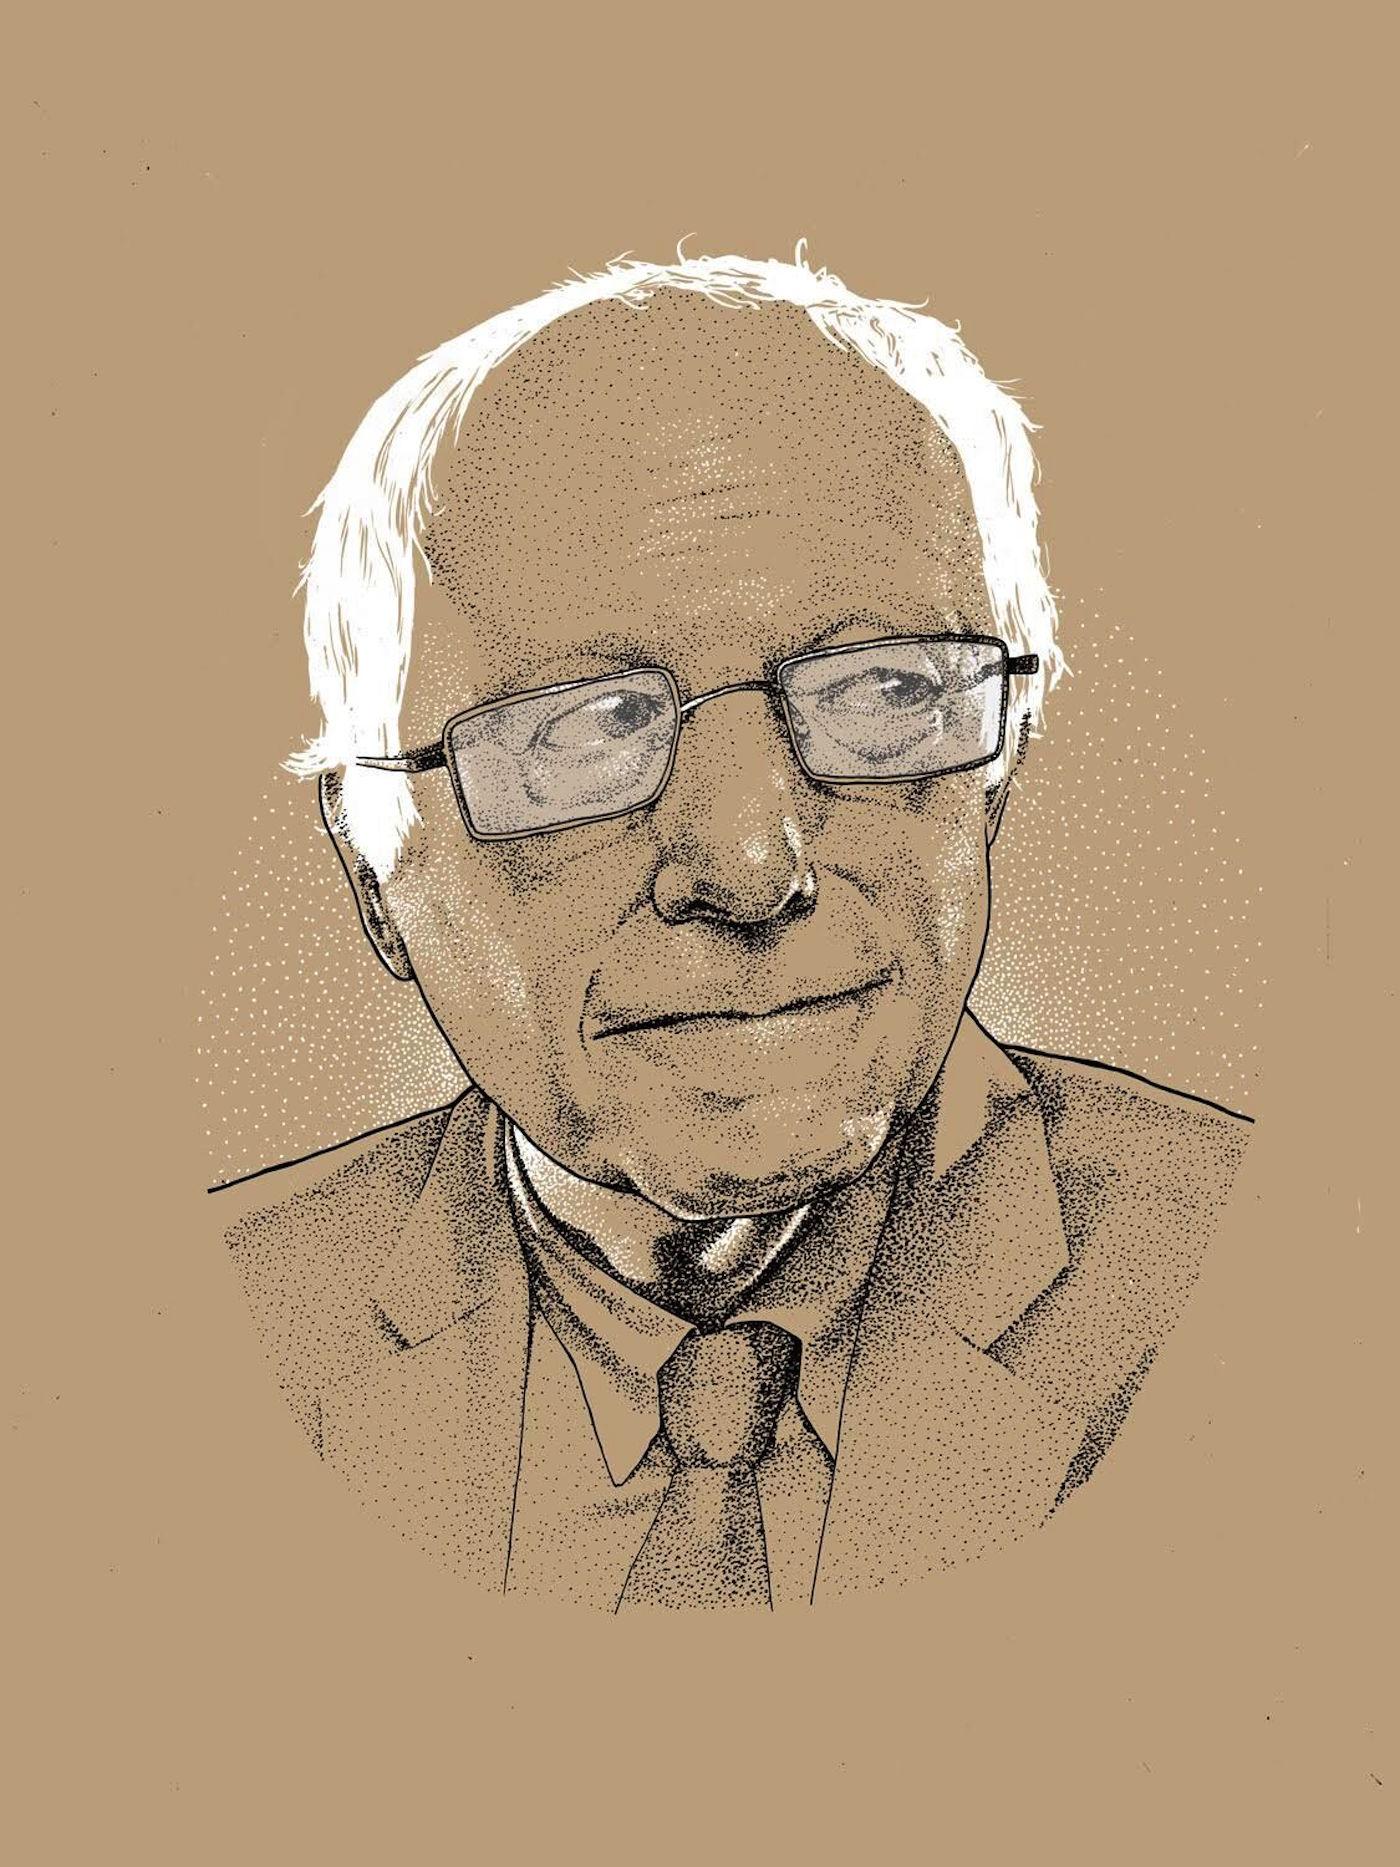 "Dave Kloc ""Bernie 2016"" (2016) (image courtesy of Bernie 2016)"